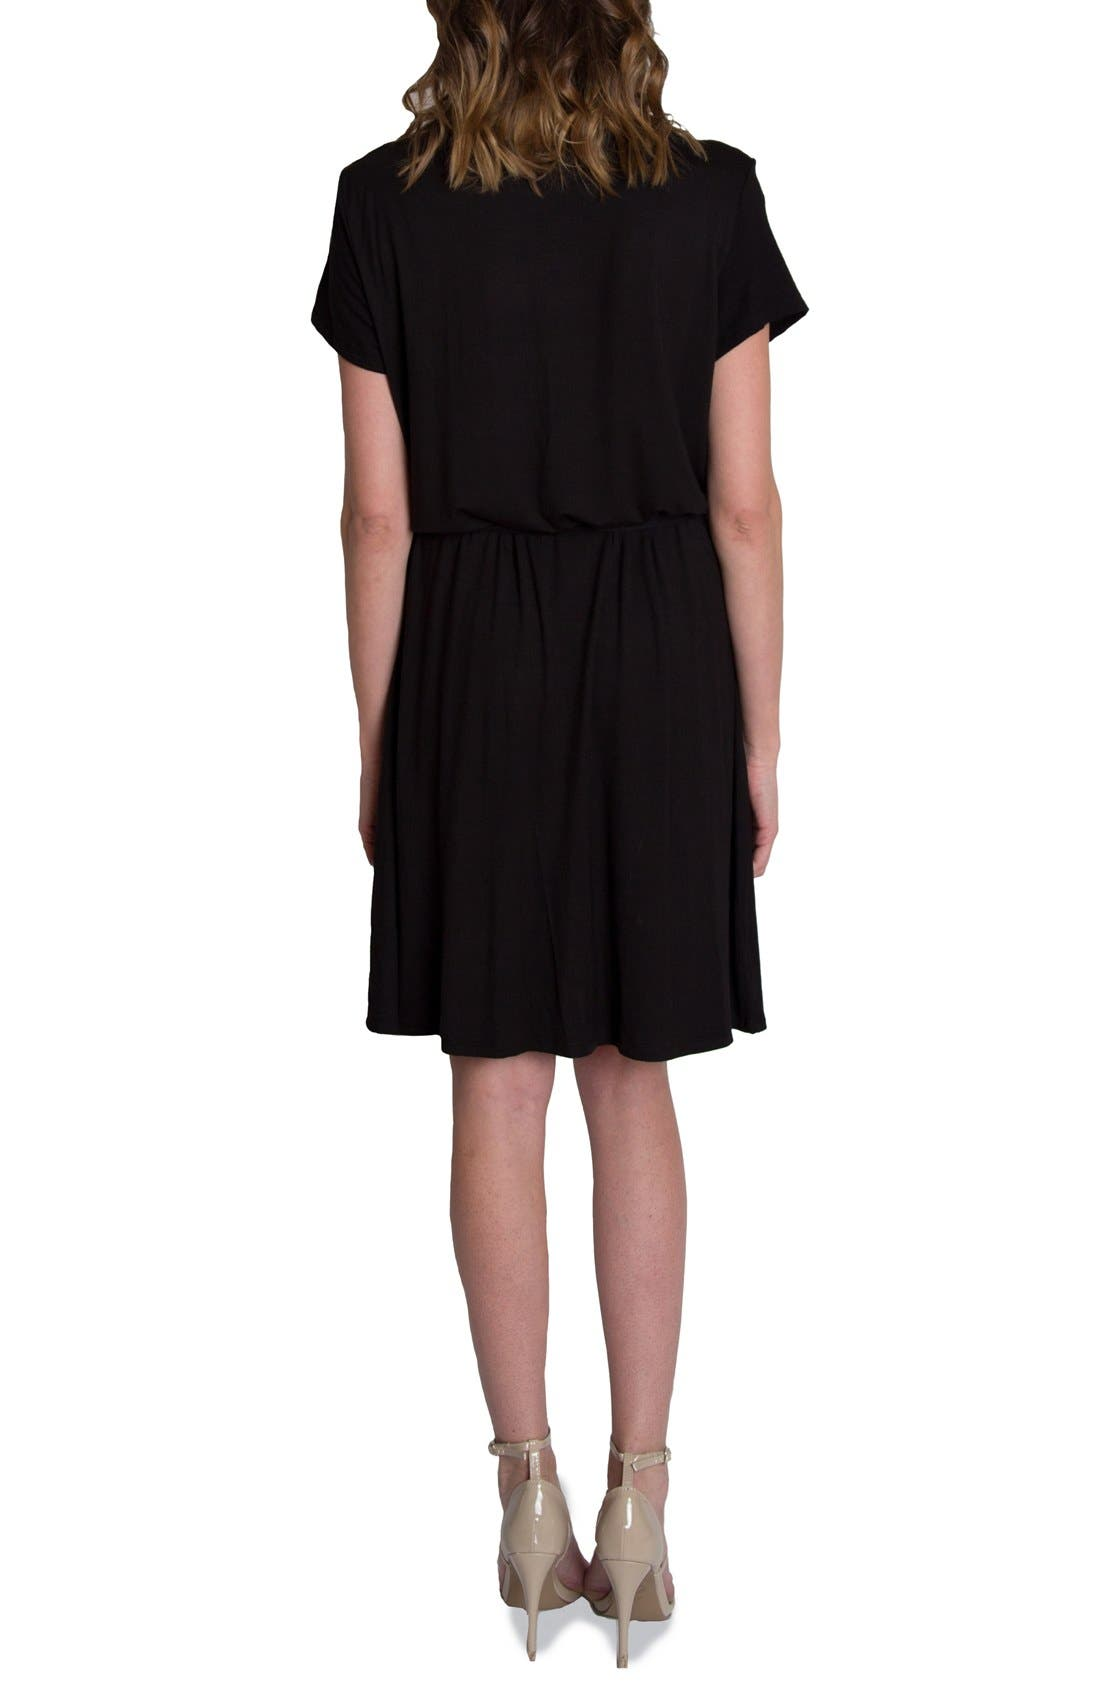 'Chic' Cowl Neck Nursing Dress,                             Alternate thumbnail 6, color,                             BLACK